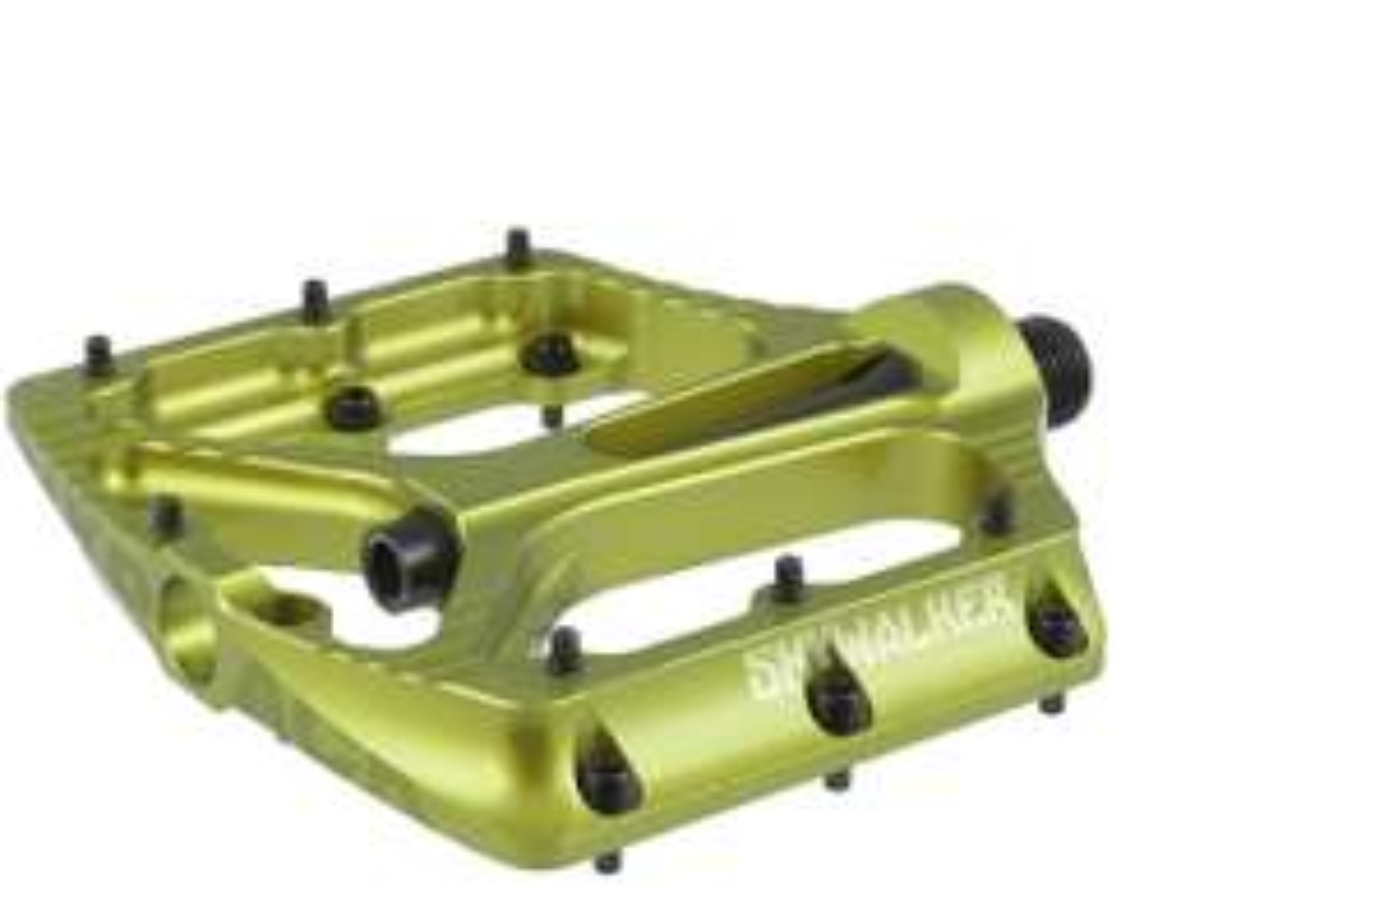 MTB Plattformpedal Sixpack SKYWALKER 3 (378gr) - Rot / Blau / Grau / Electric Green